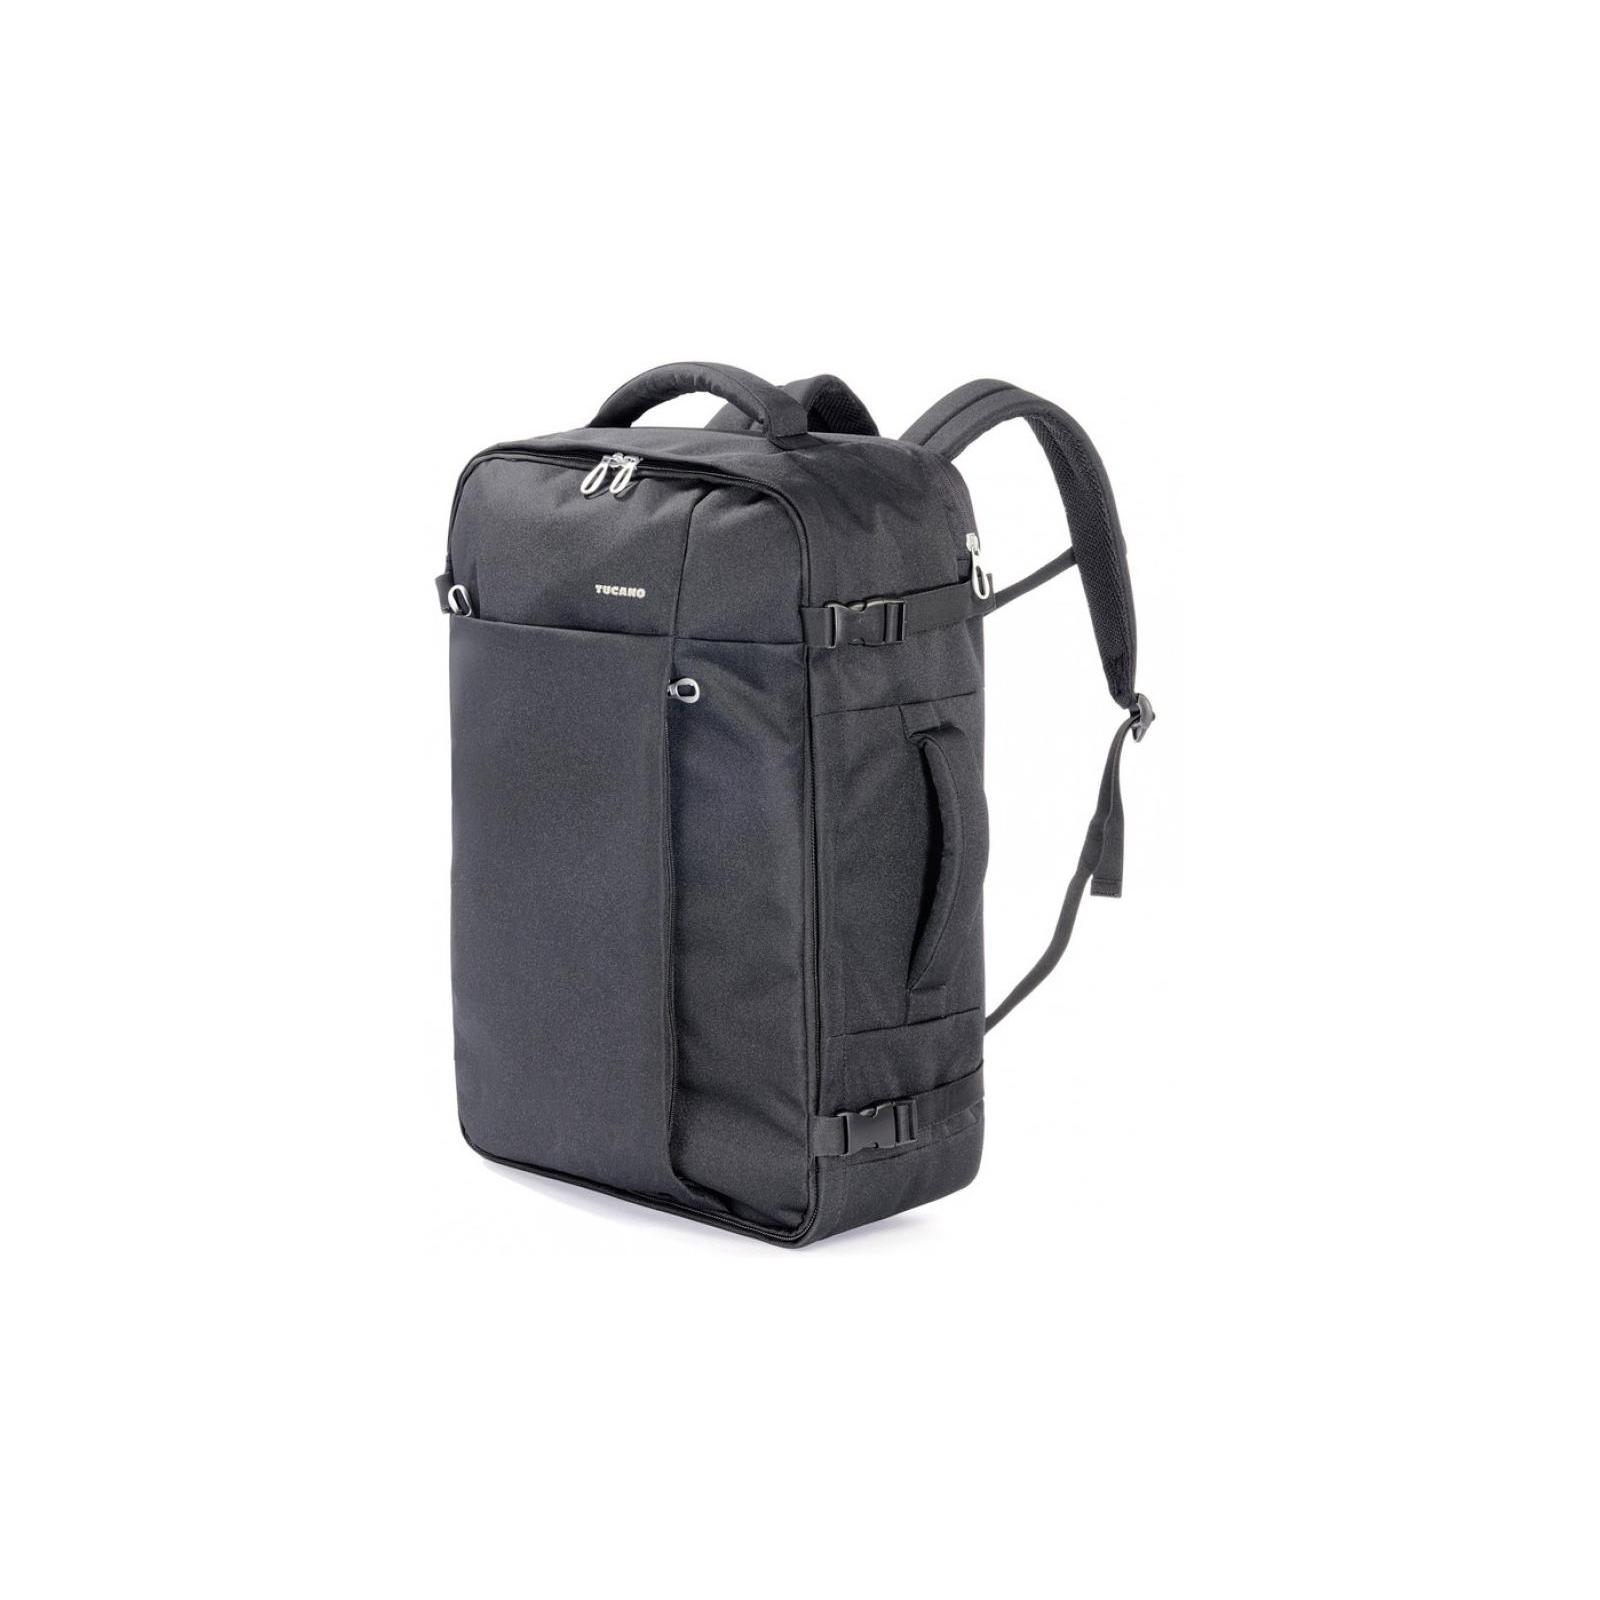 "Рюкзак для ноутбука Tucano 17.3"" TUGO' L CABIN black (BKTUG-L-BK)"